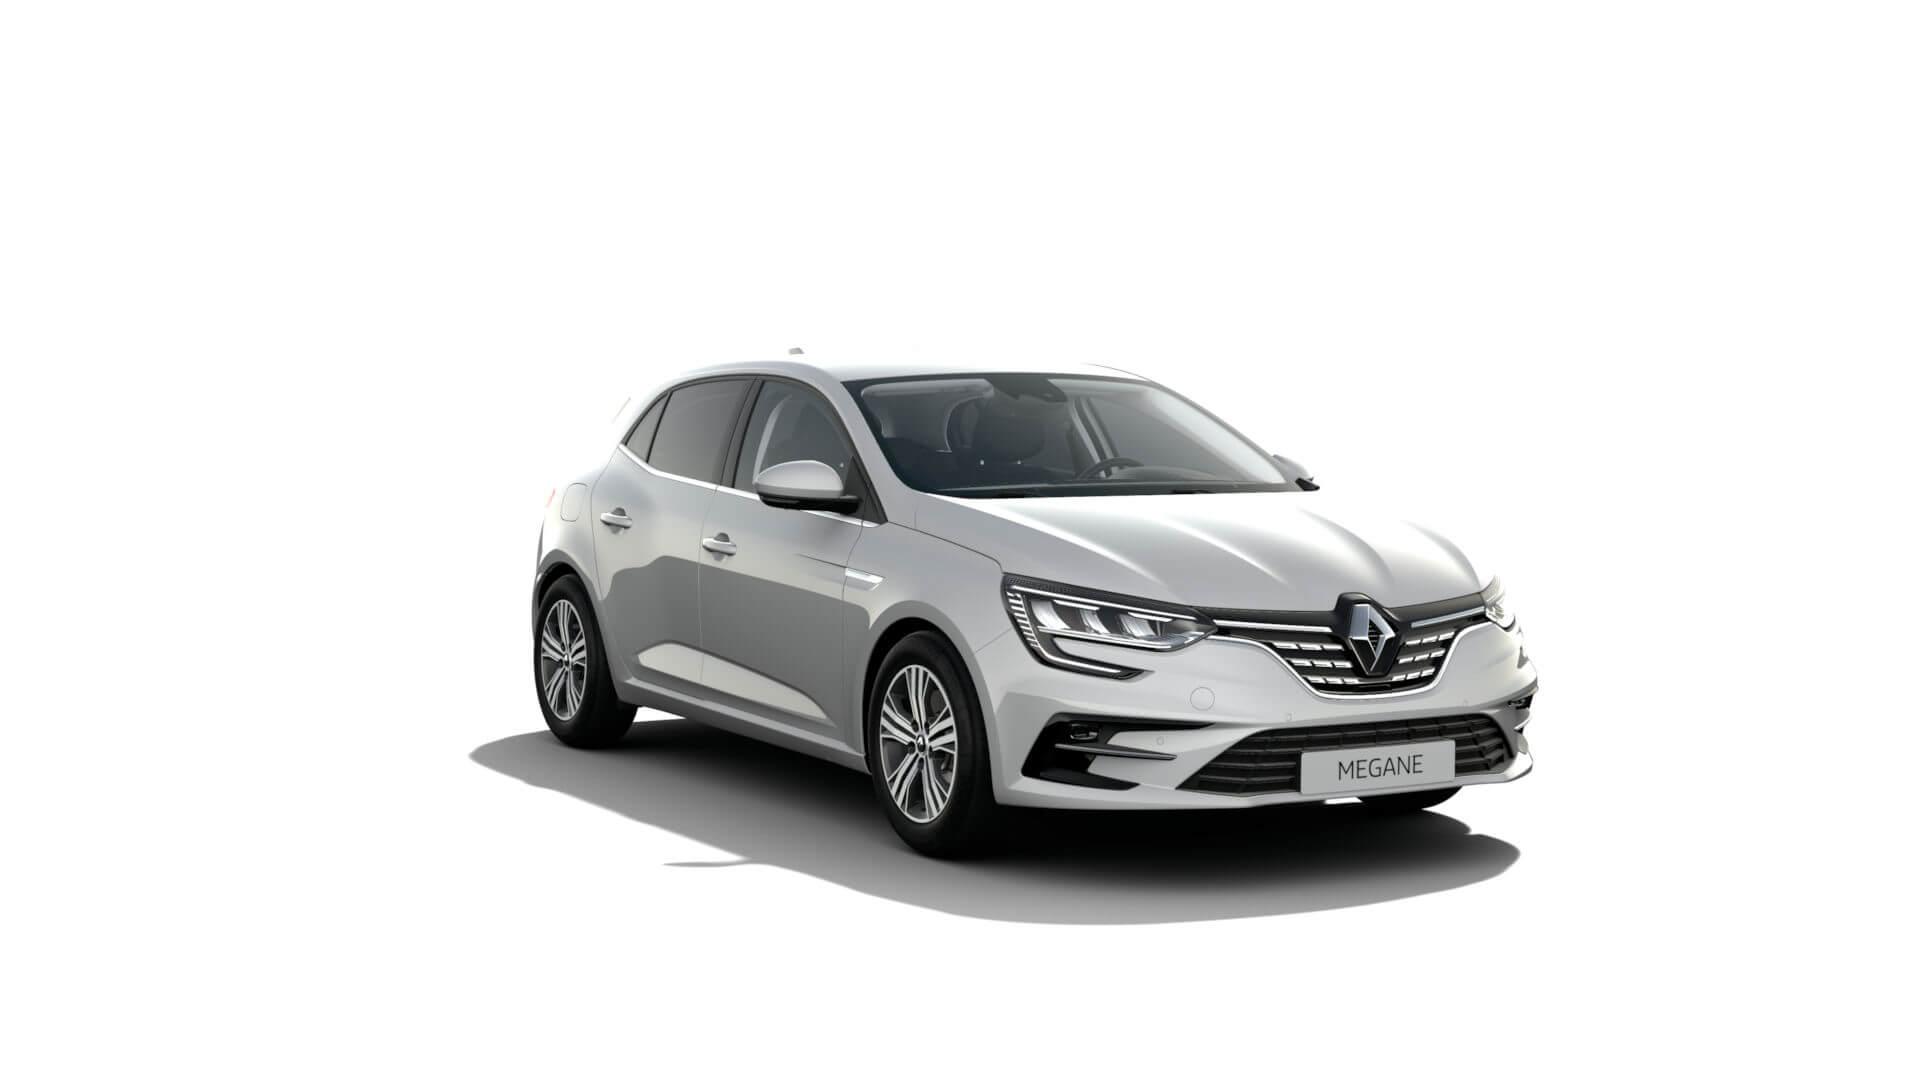 Automodell weiß - Renault Megane - Renault Ahrens Hannover